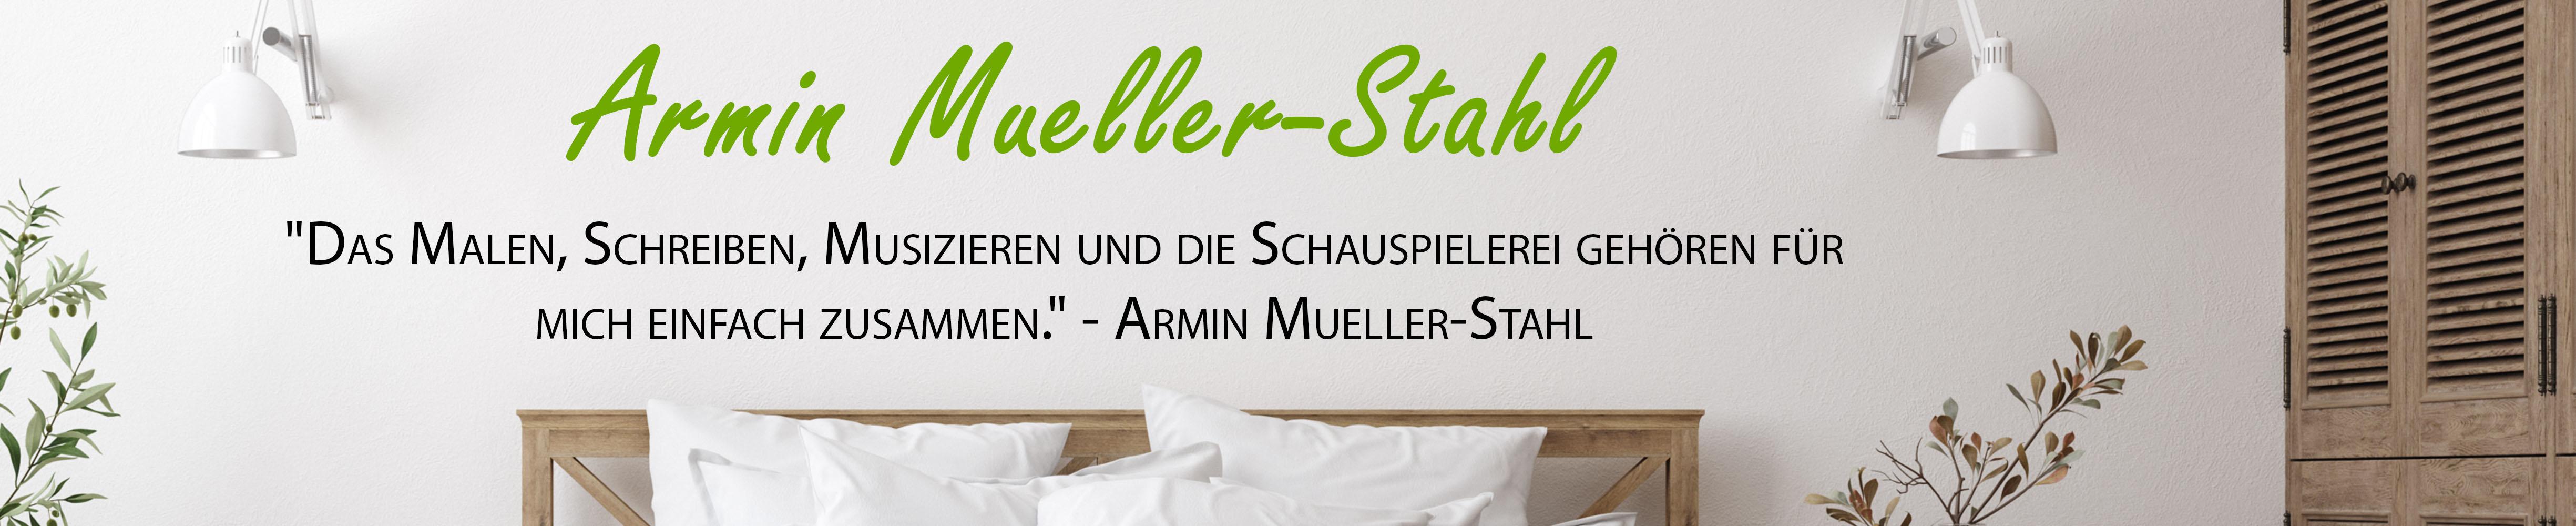 Kategorie: Armin Mueller-Stahl